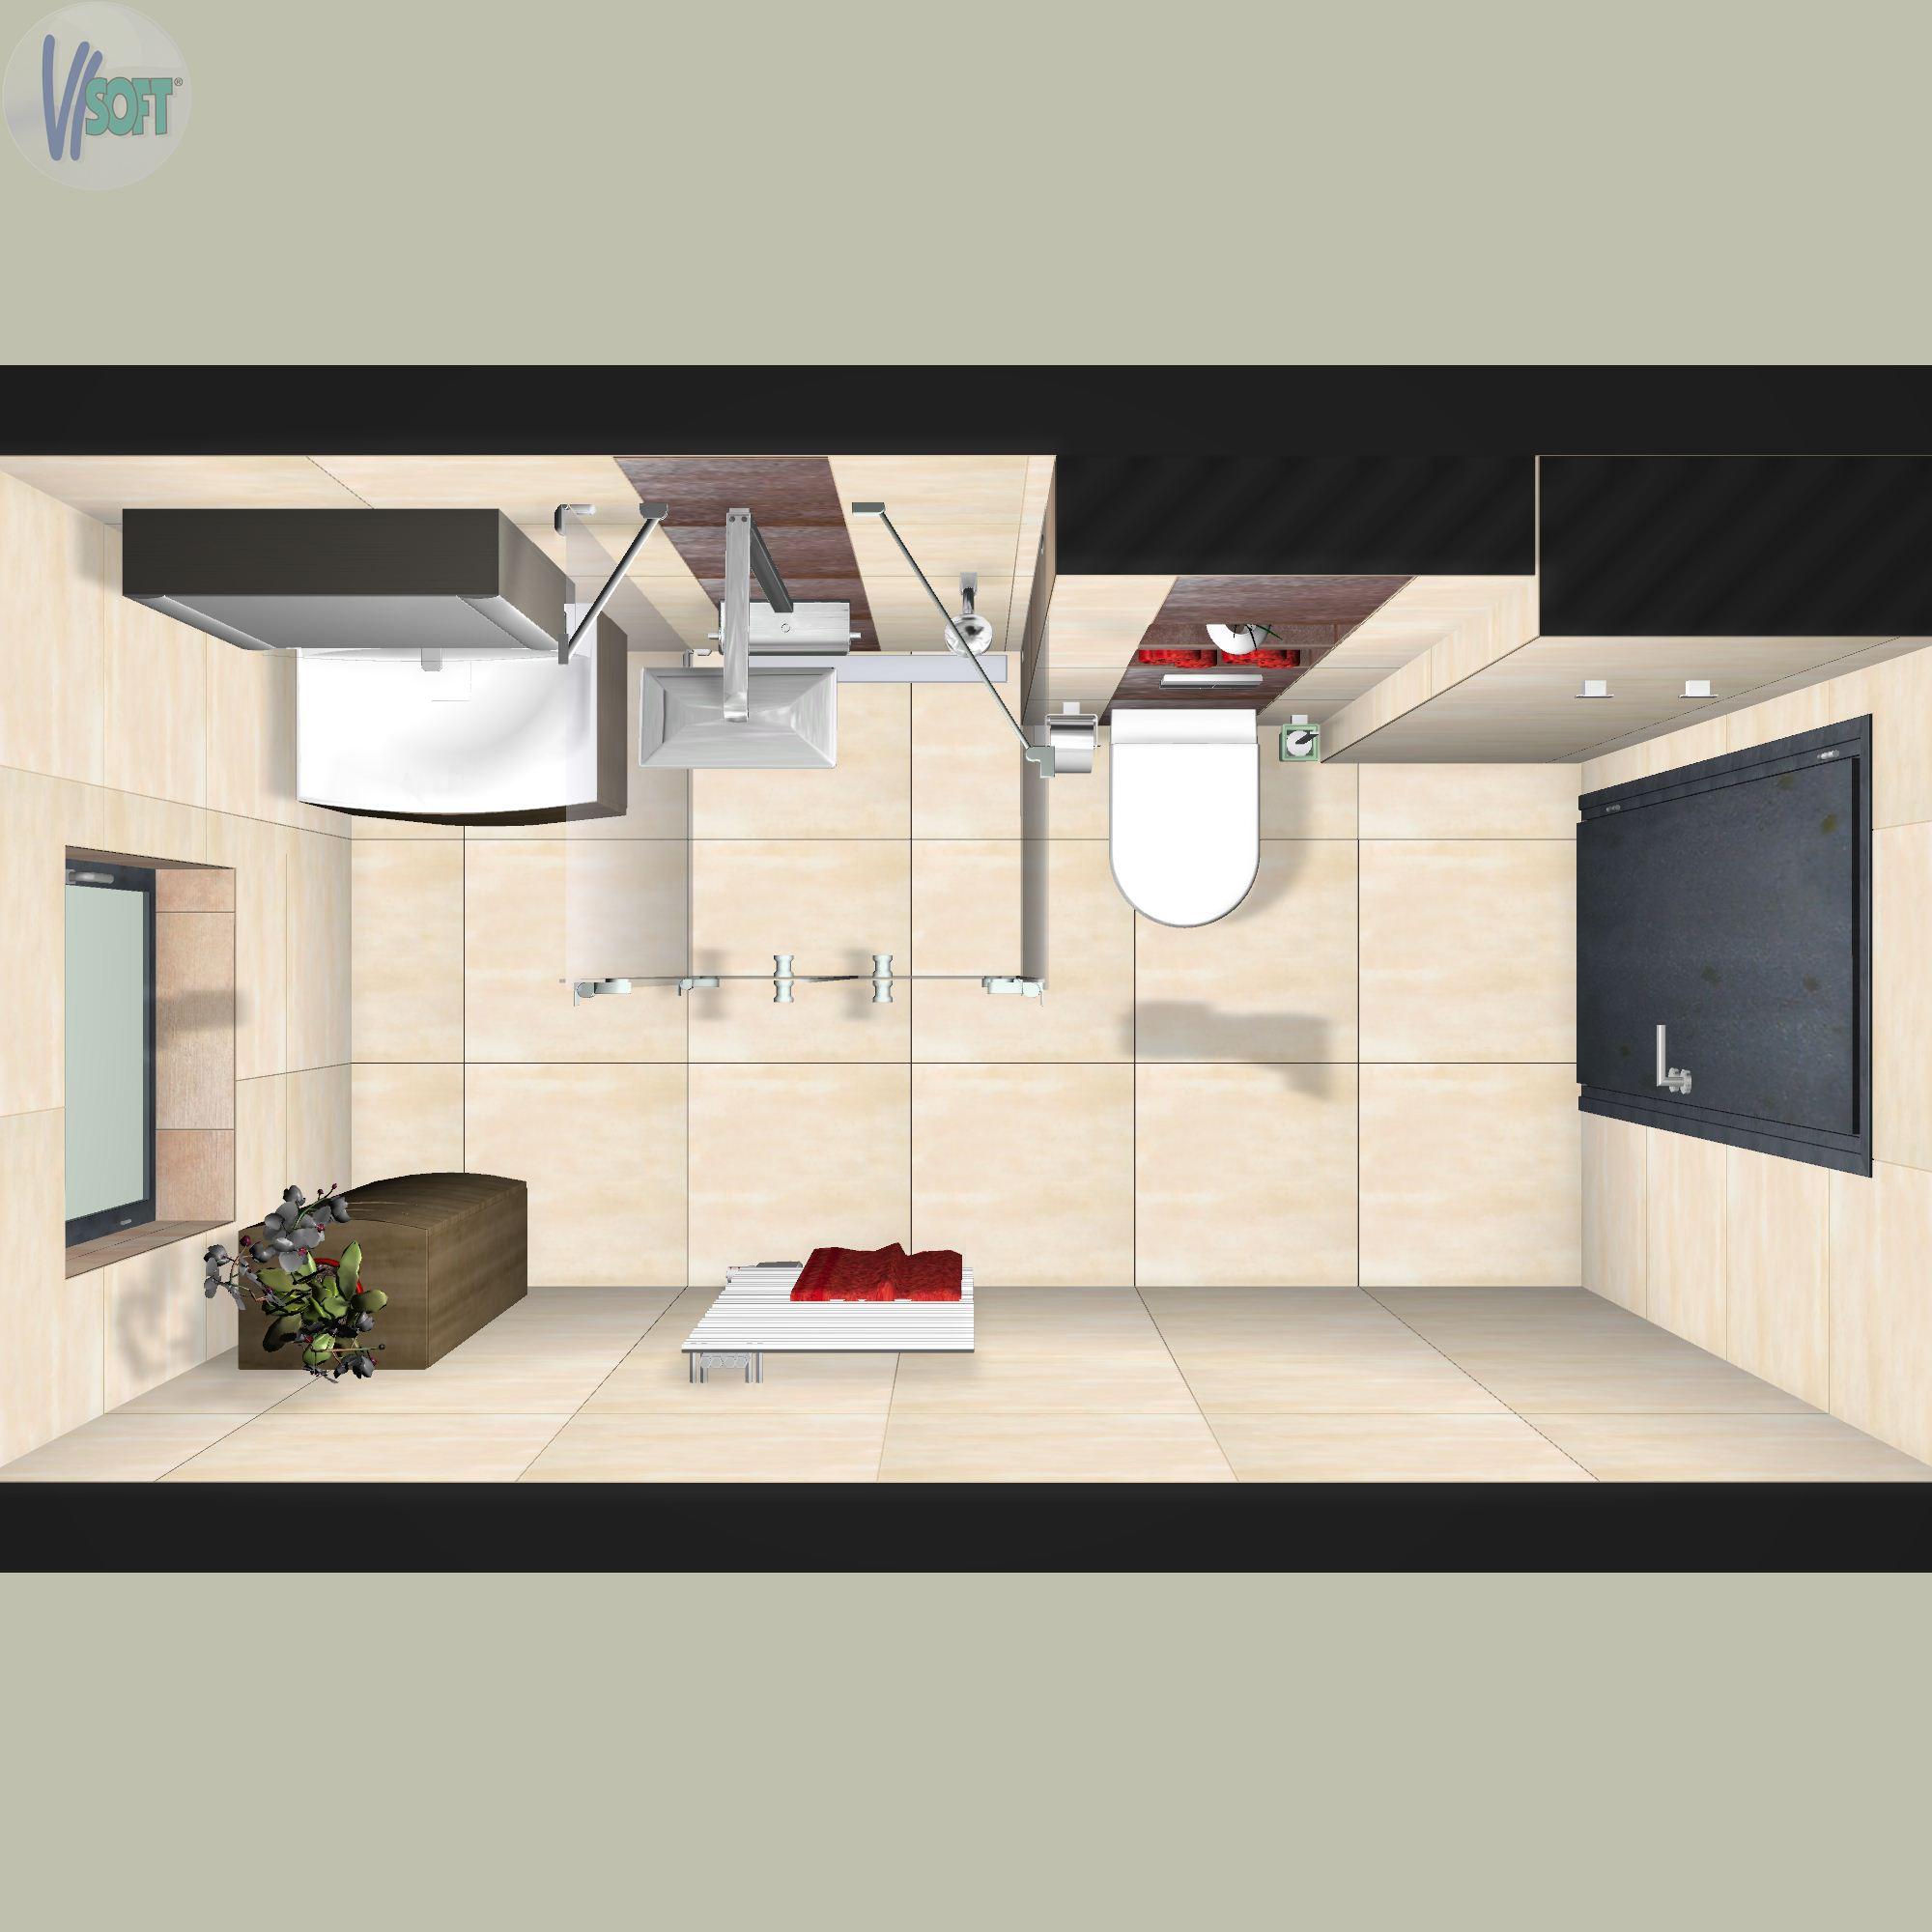 badezimmerplanung 3d kostenlos ikea k che selbstplanungsservice hjaerta foton kostenlose. Black Bedroom Furniture Sets. Home Design Ideas